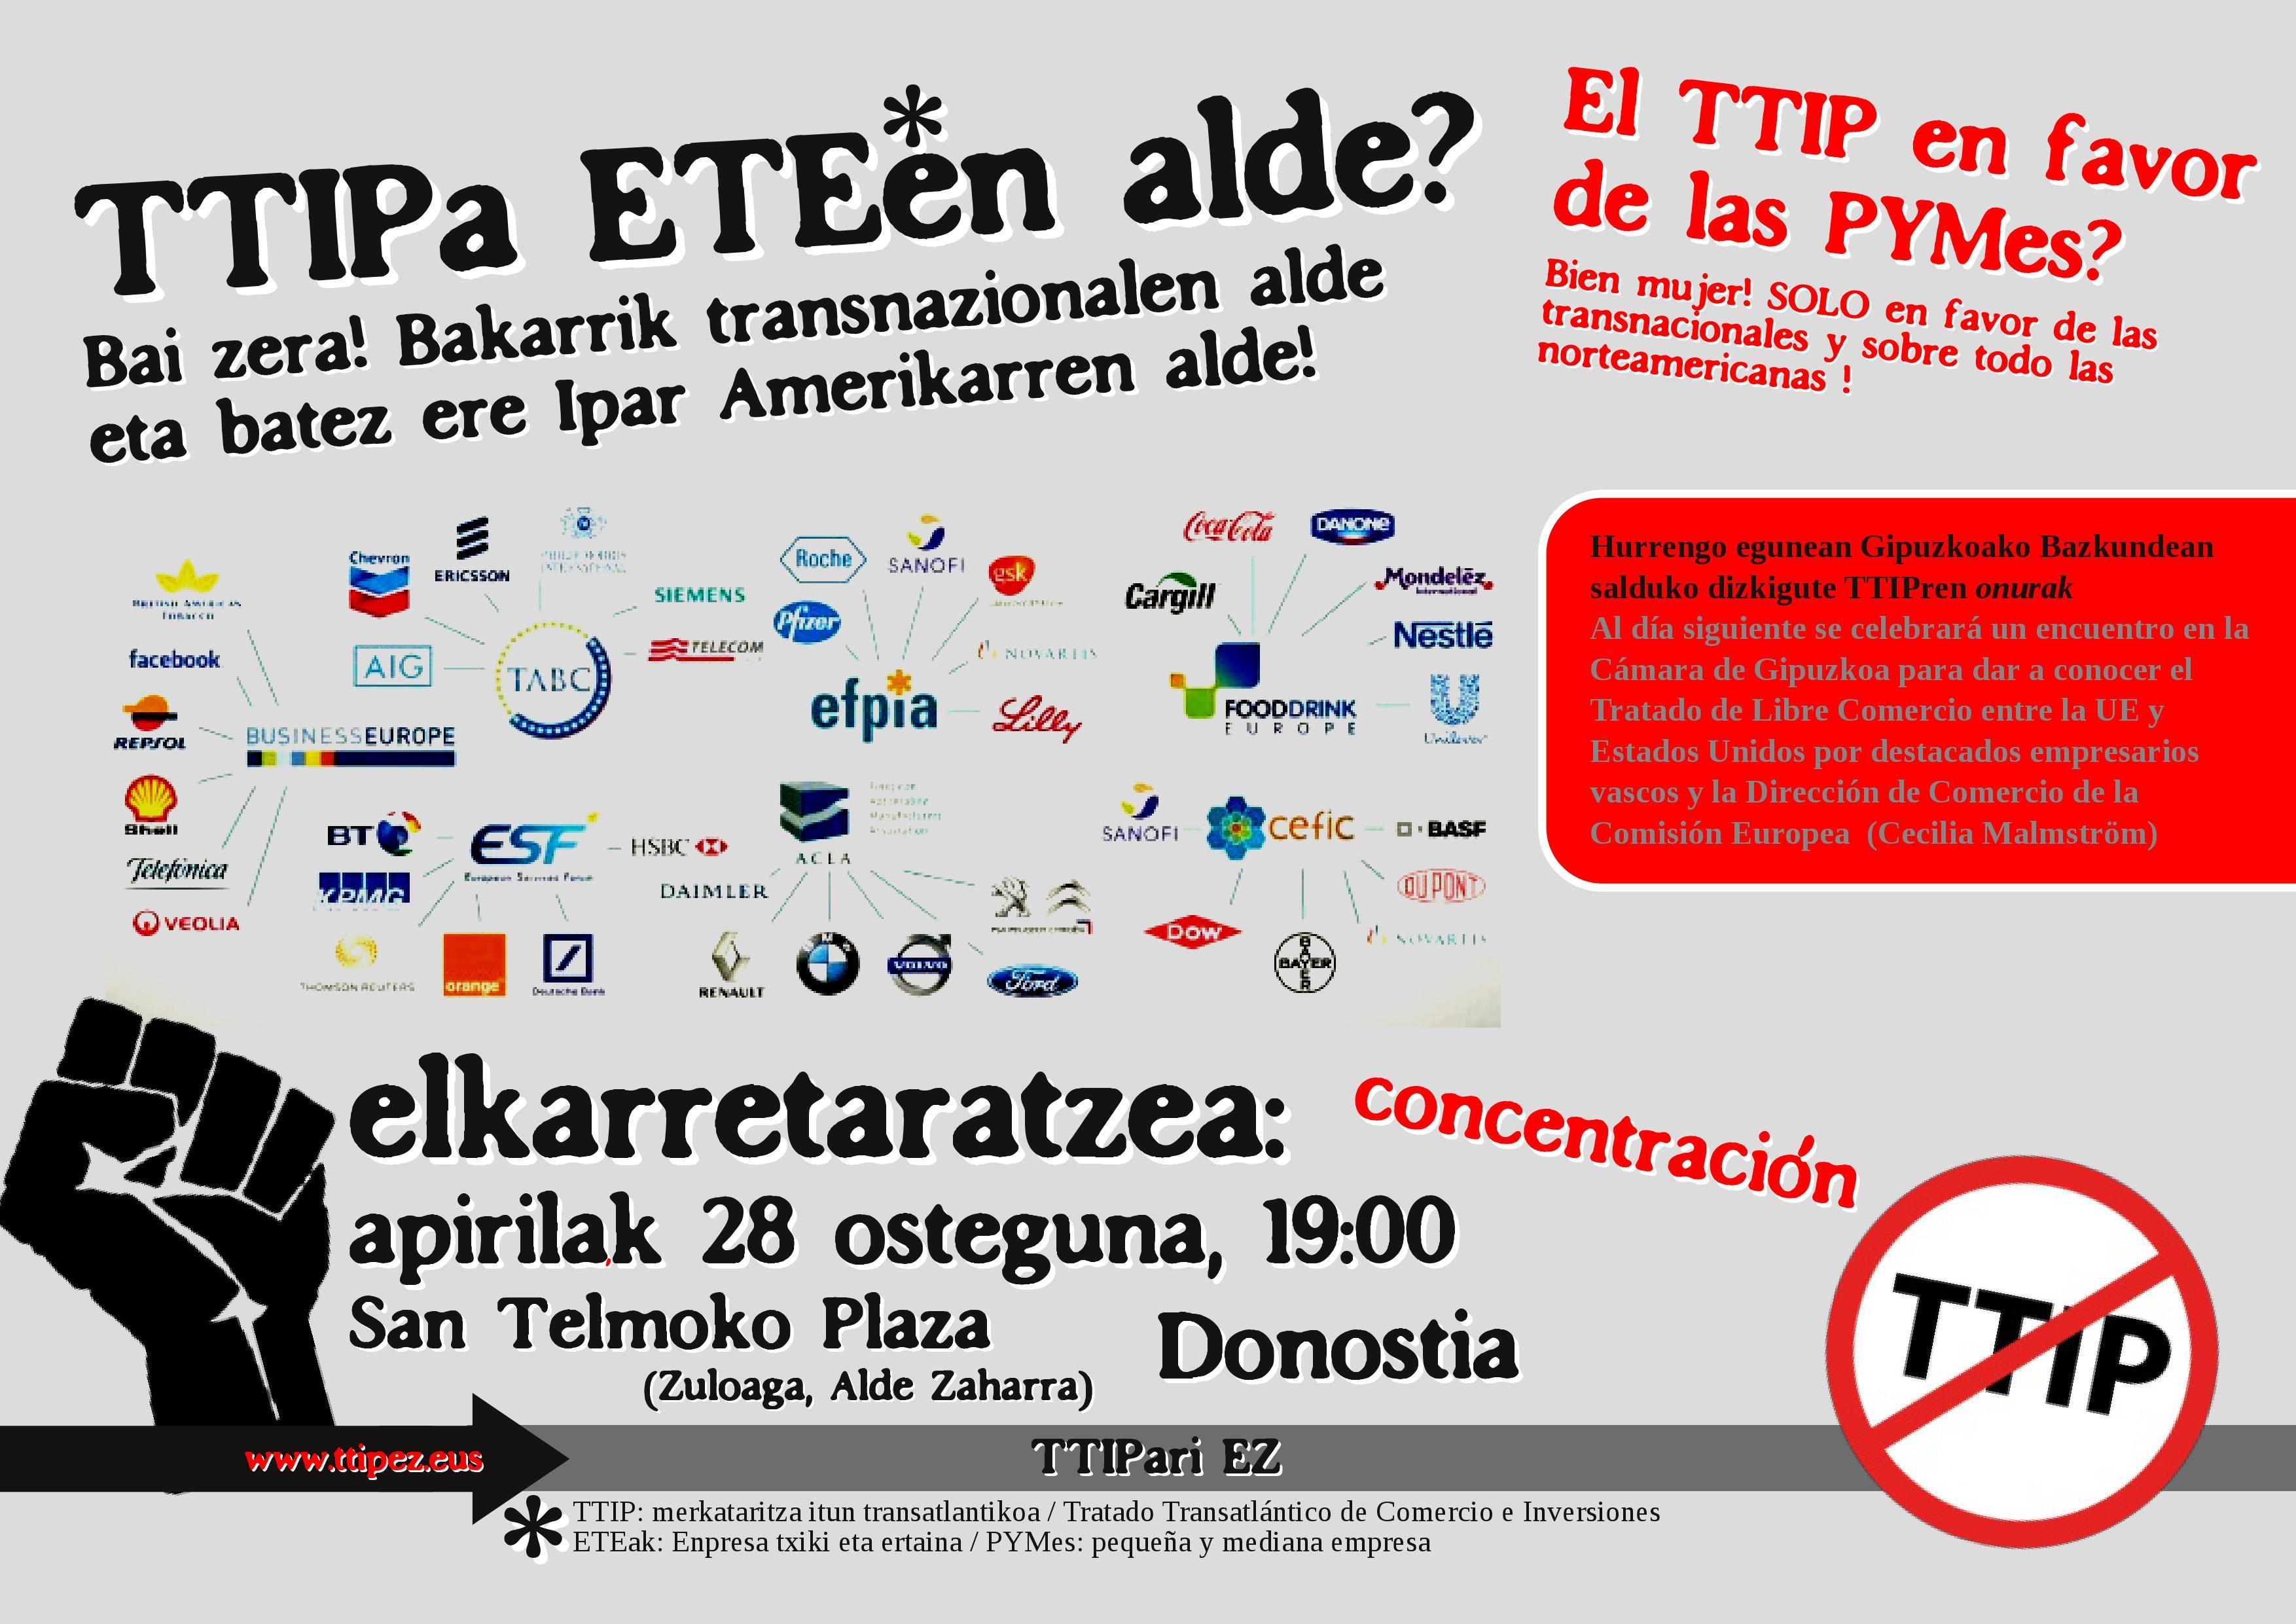 ap 28 TTIP kartela